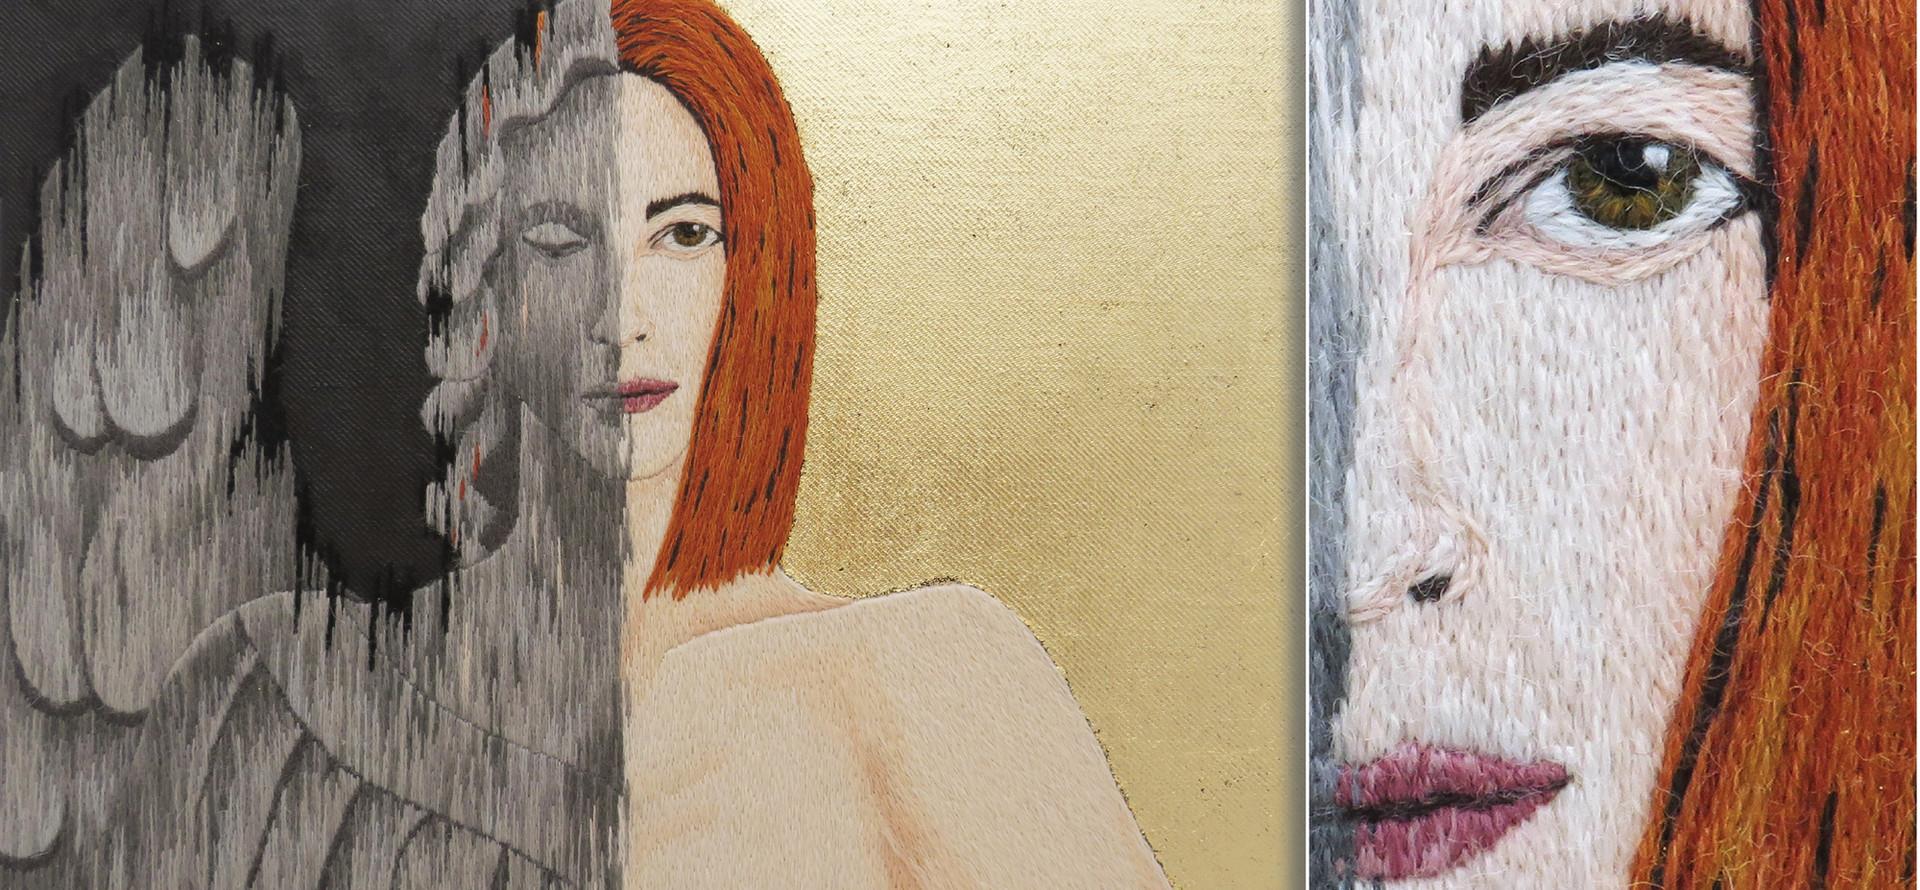 CHOOSE LIFE by Maree Burnnand, Central Taranaki Guild.